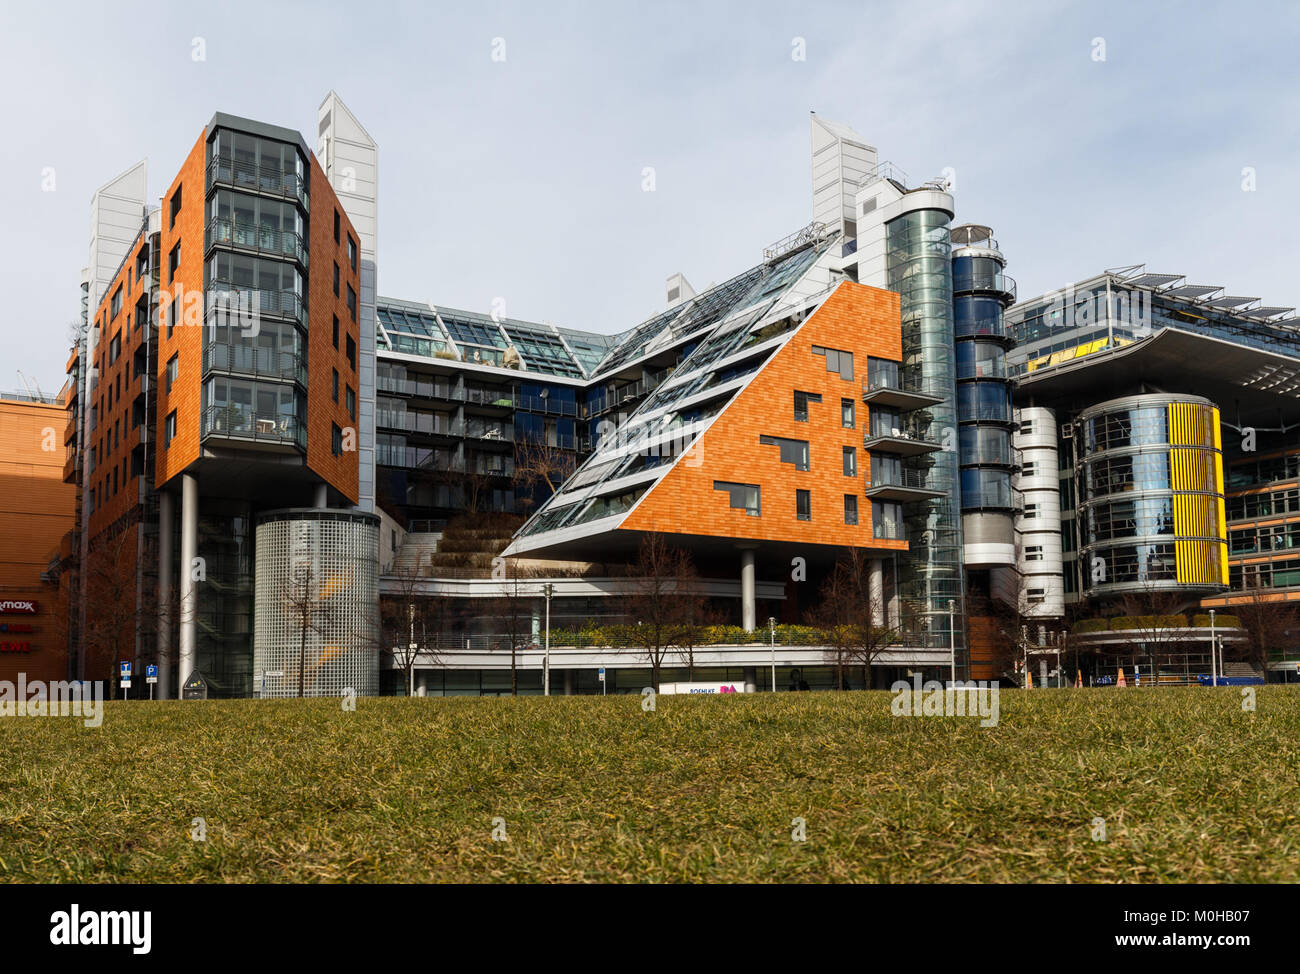 Bürogebäude am Potsdamer Platz 20150224 8. Stockbild